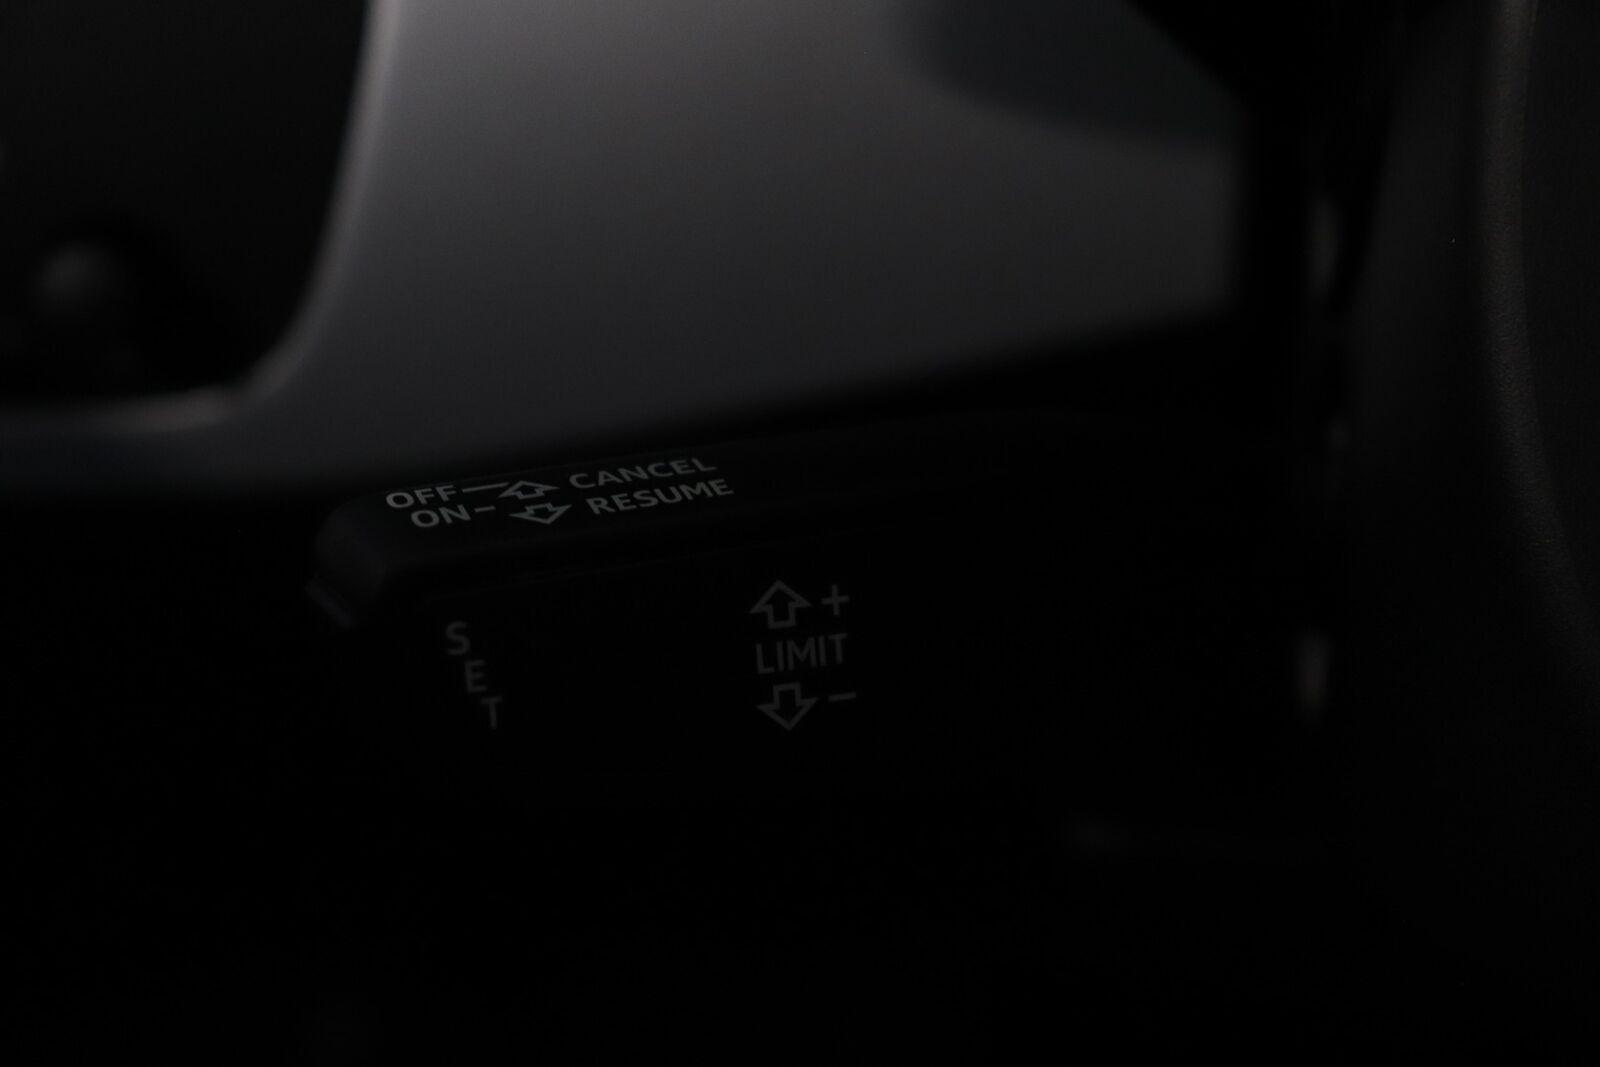 Audi A4 TDi 150 Avant S-tr.